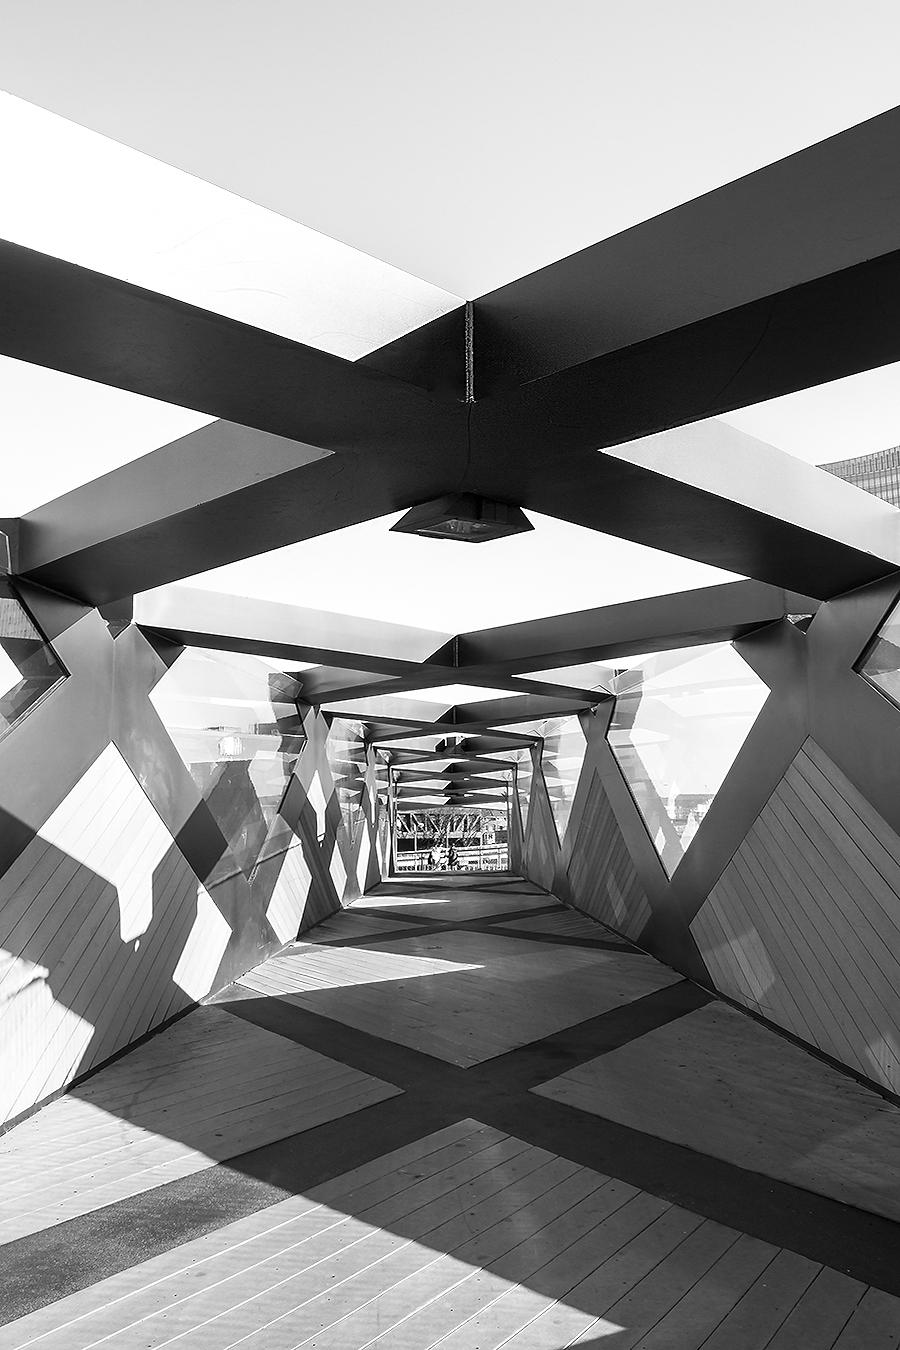 Janelle_Tong_Photography_Tony_Ward_Studio_Individual_Project_UPenn_Penn_Park_Bridges_Skyline_Bridge_Crosses_Perspective_Black_and_White